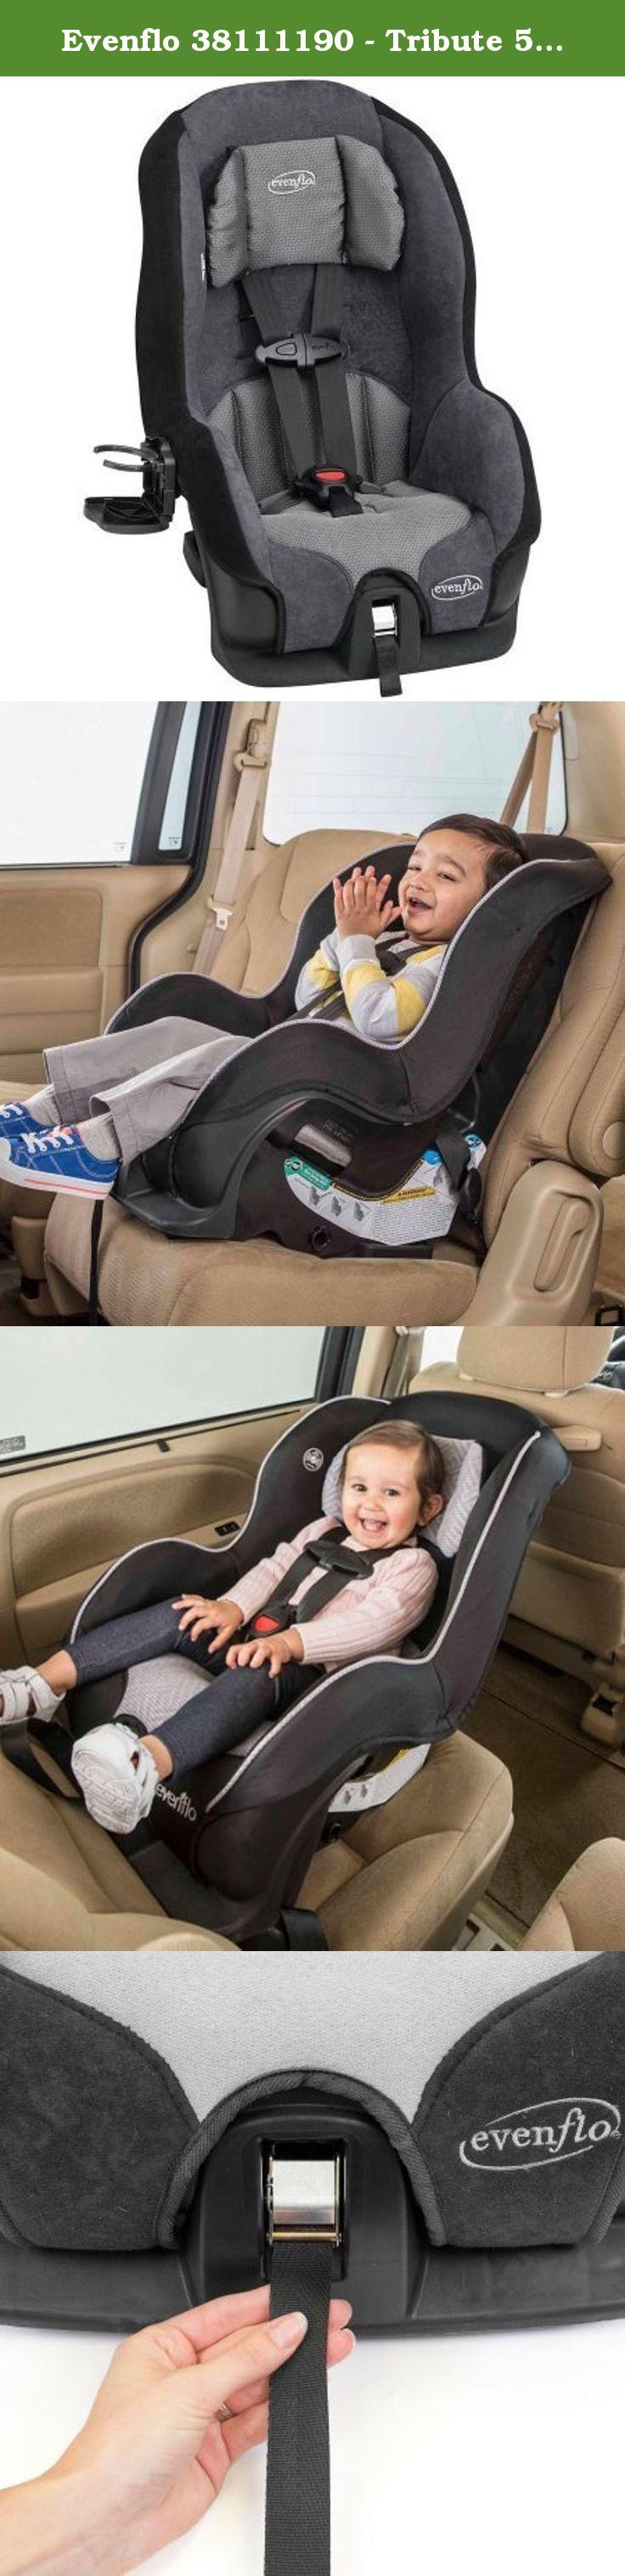 Tribute 5 DLX Convertible Car Seat